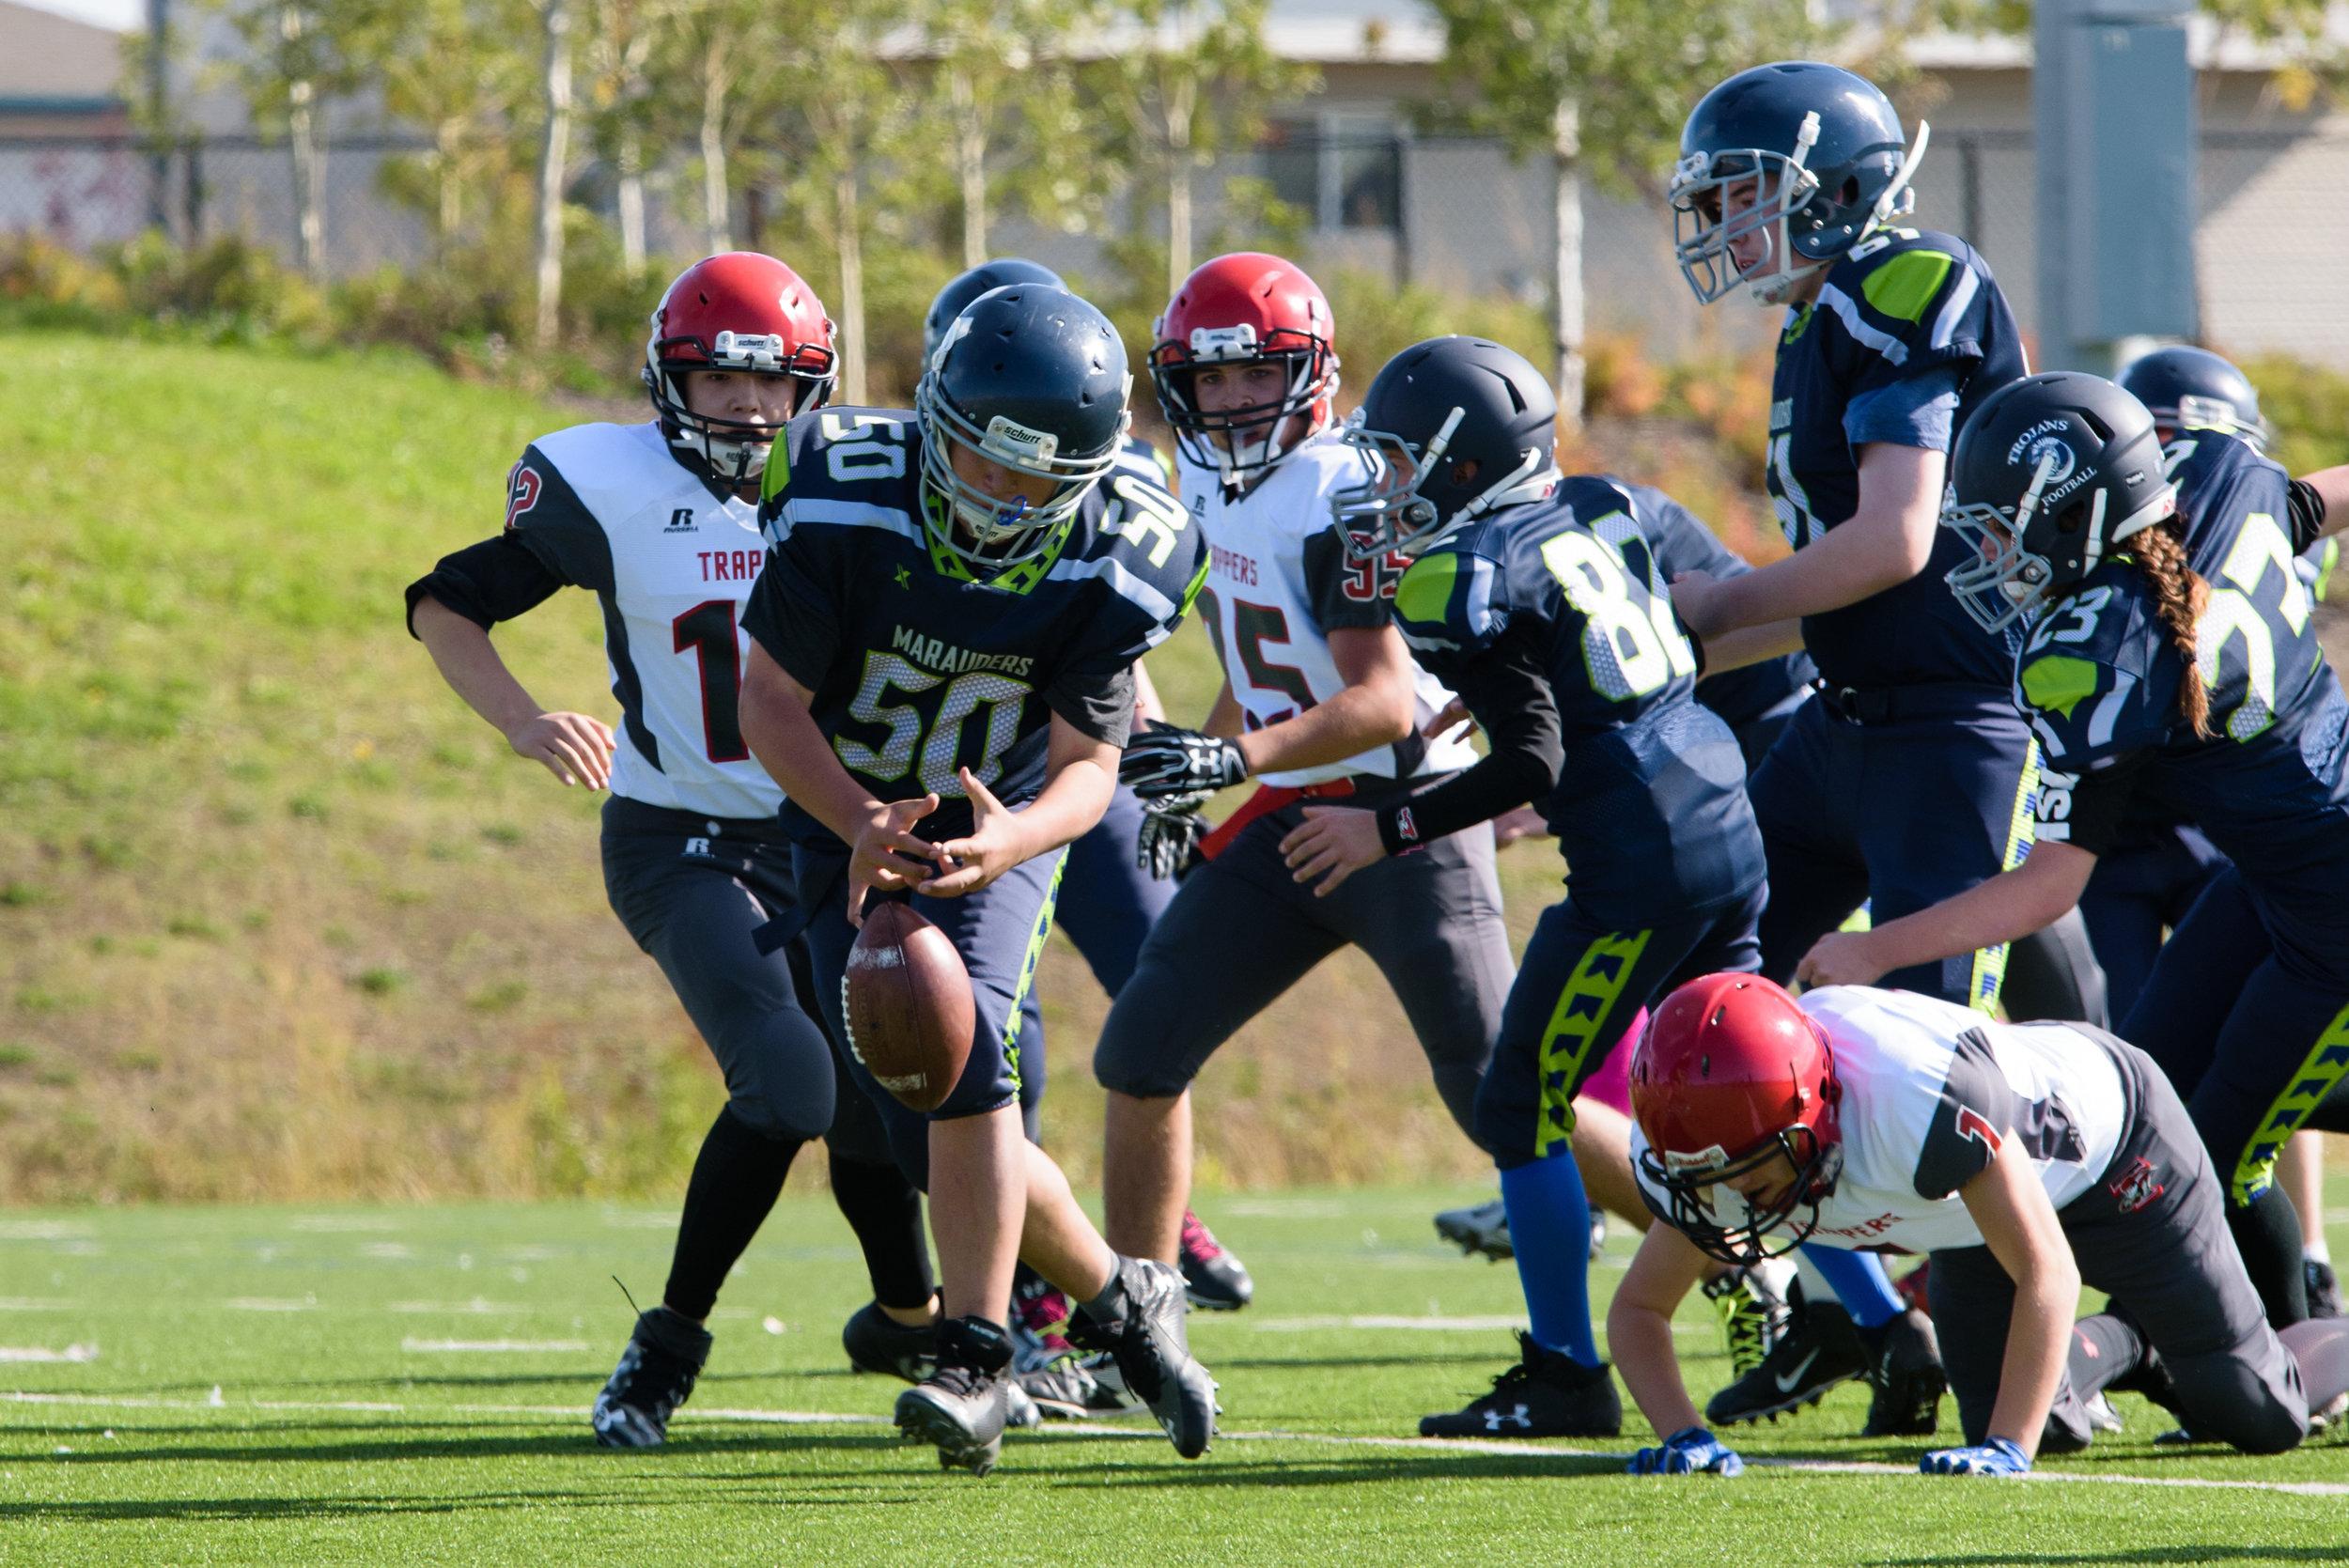 HS Football-3145.jpg